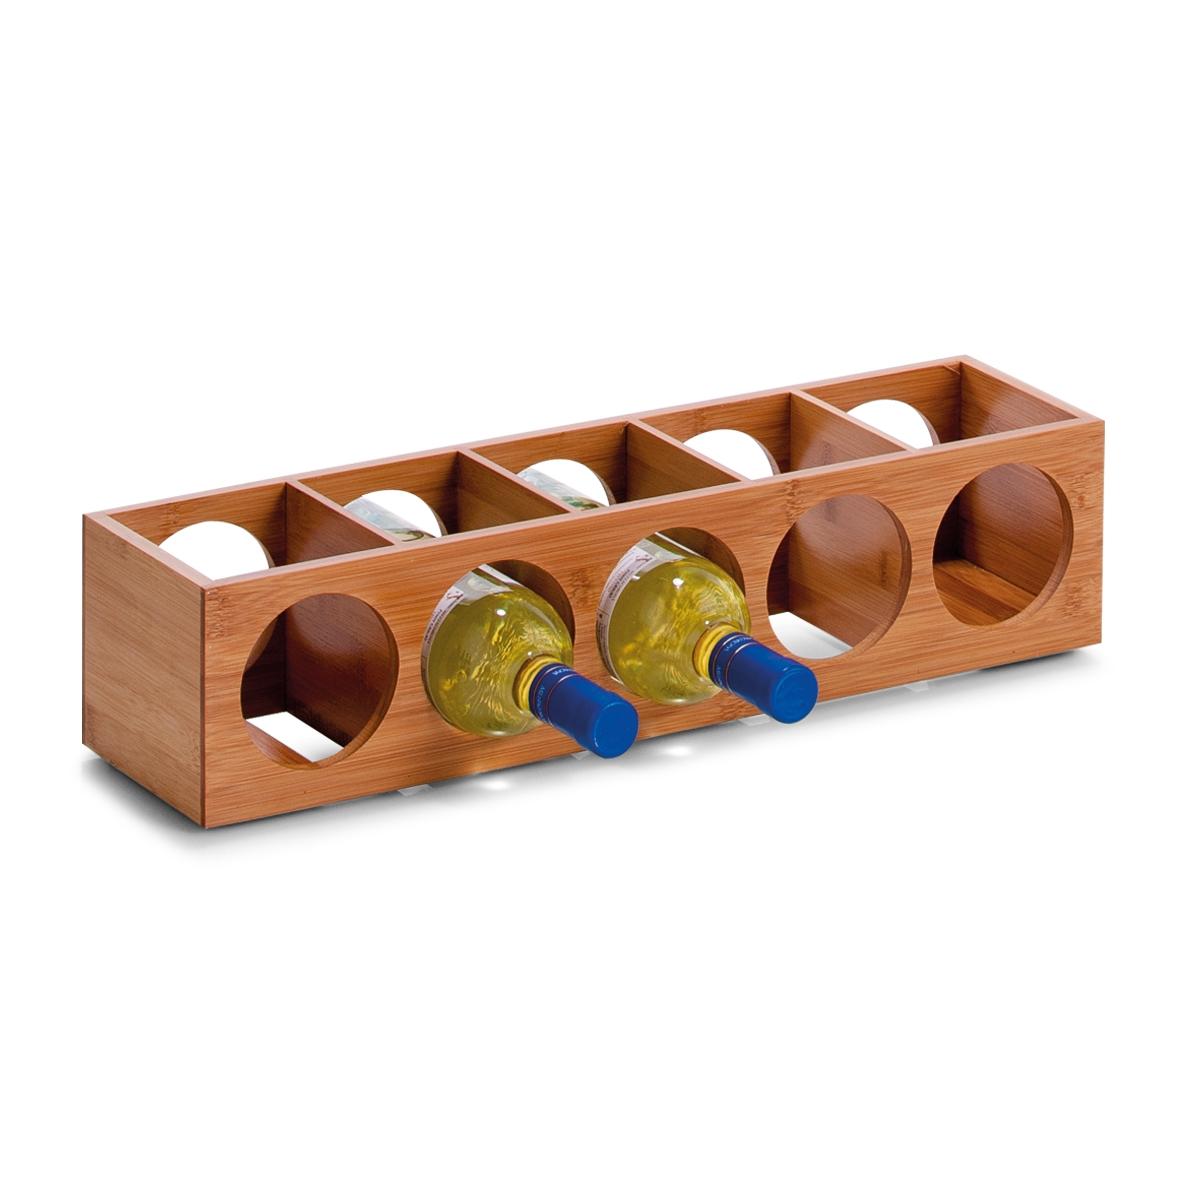 Suport din bambus pentru 5 sticle Rack Natural, l13,5xA12,5xH53 cm imagine